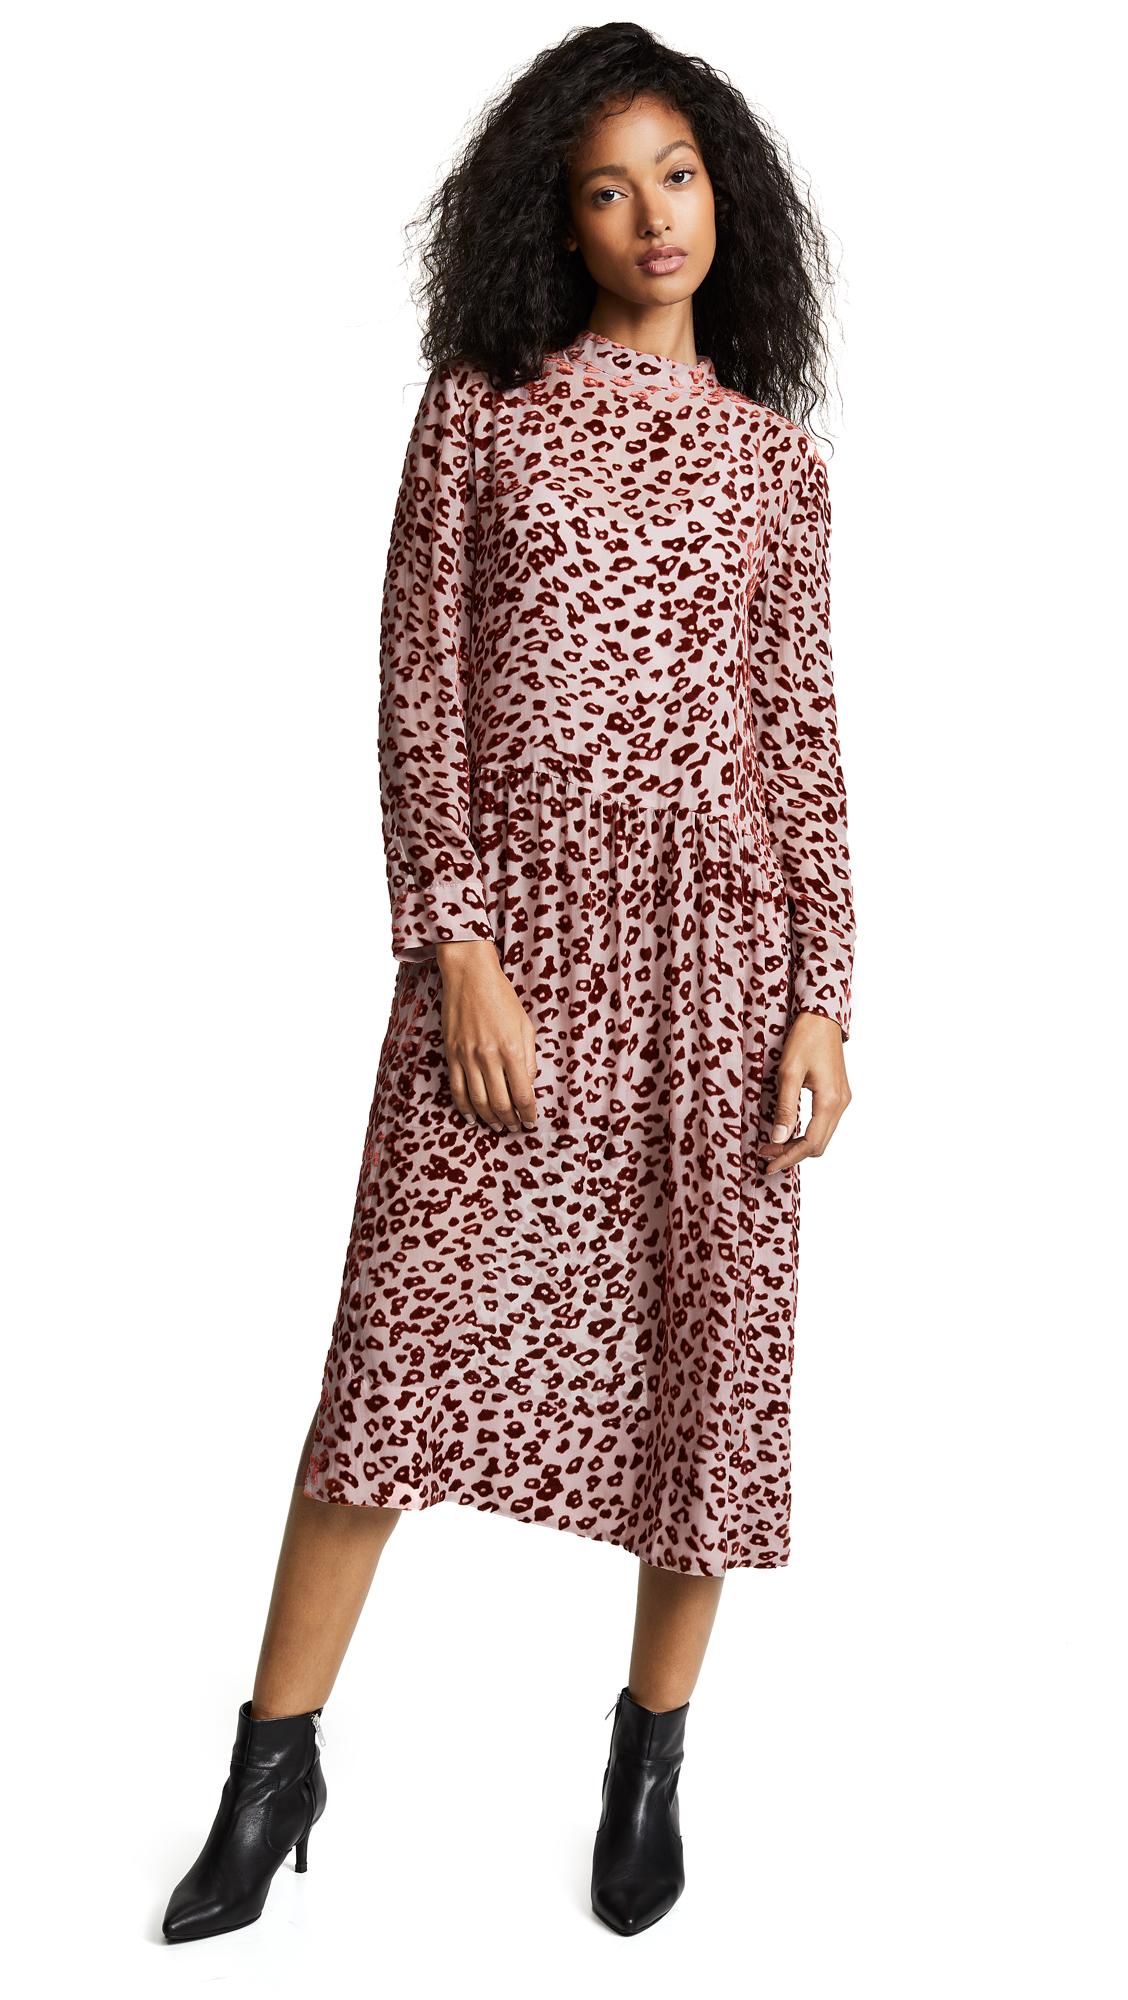 Rag & Bone Gia Dress